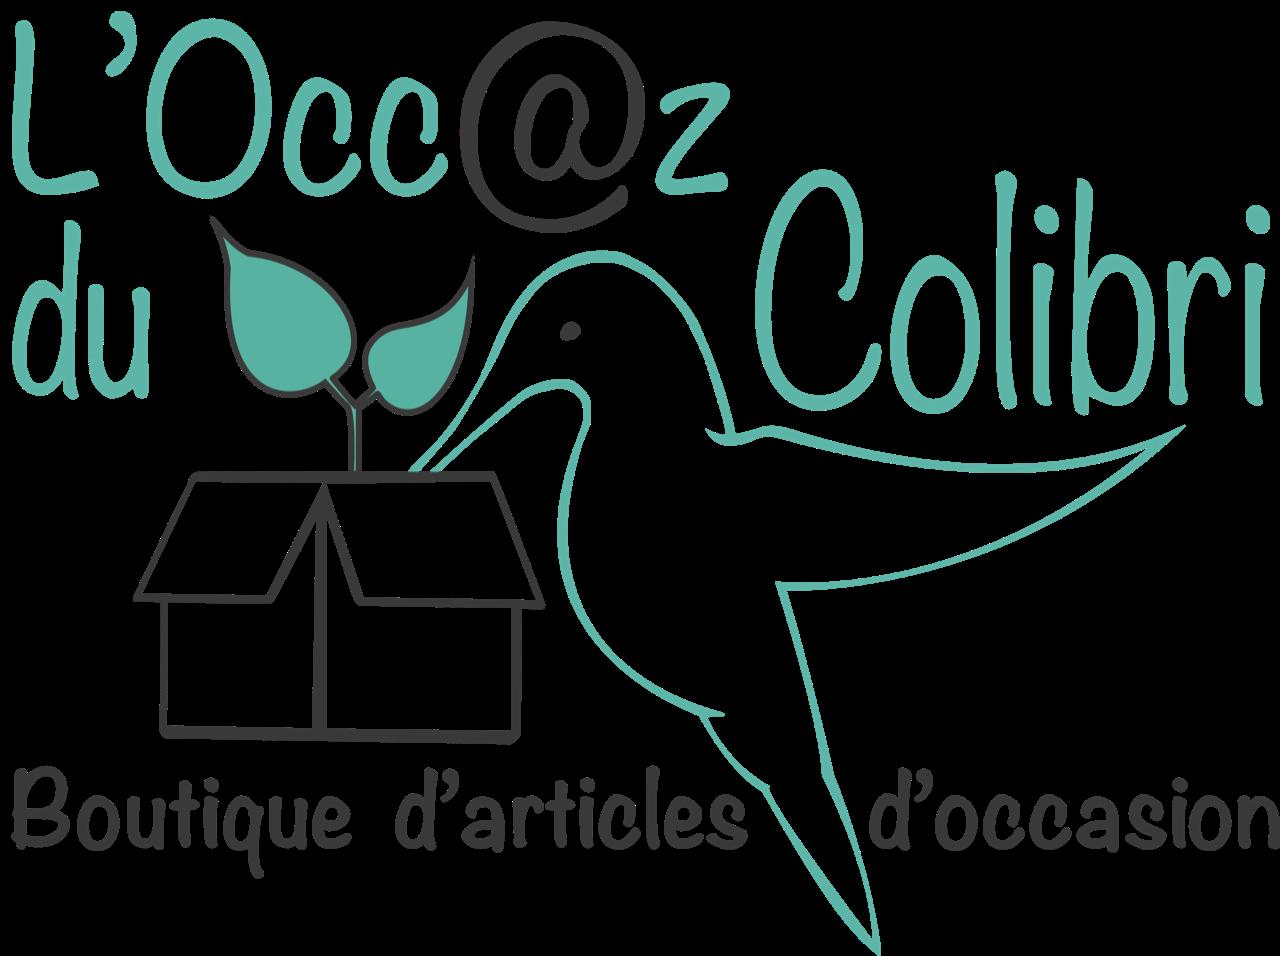 L'Occ@z du colibri